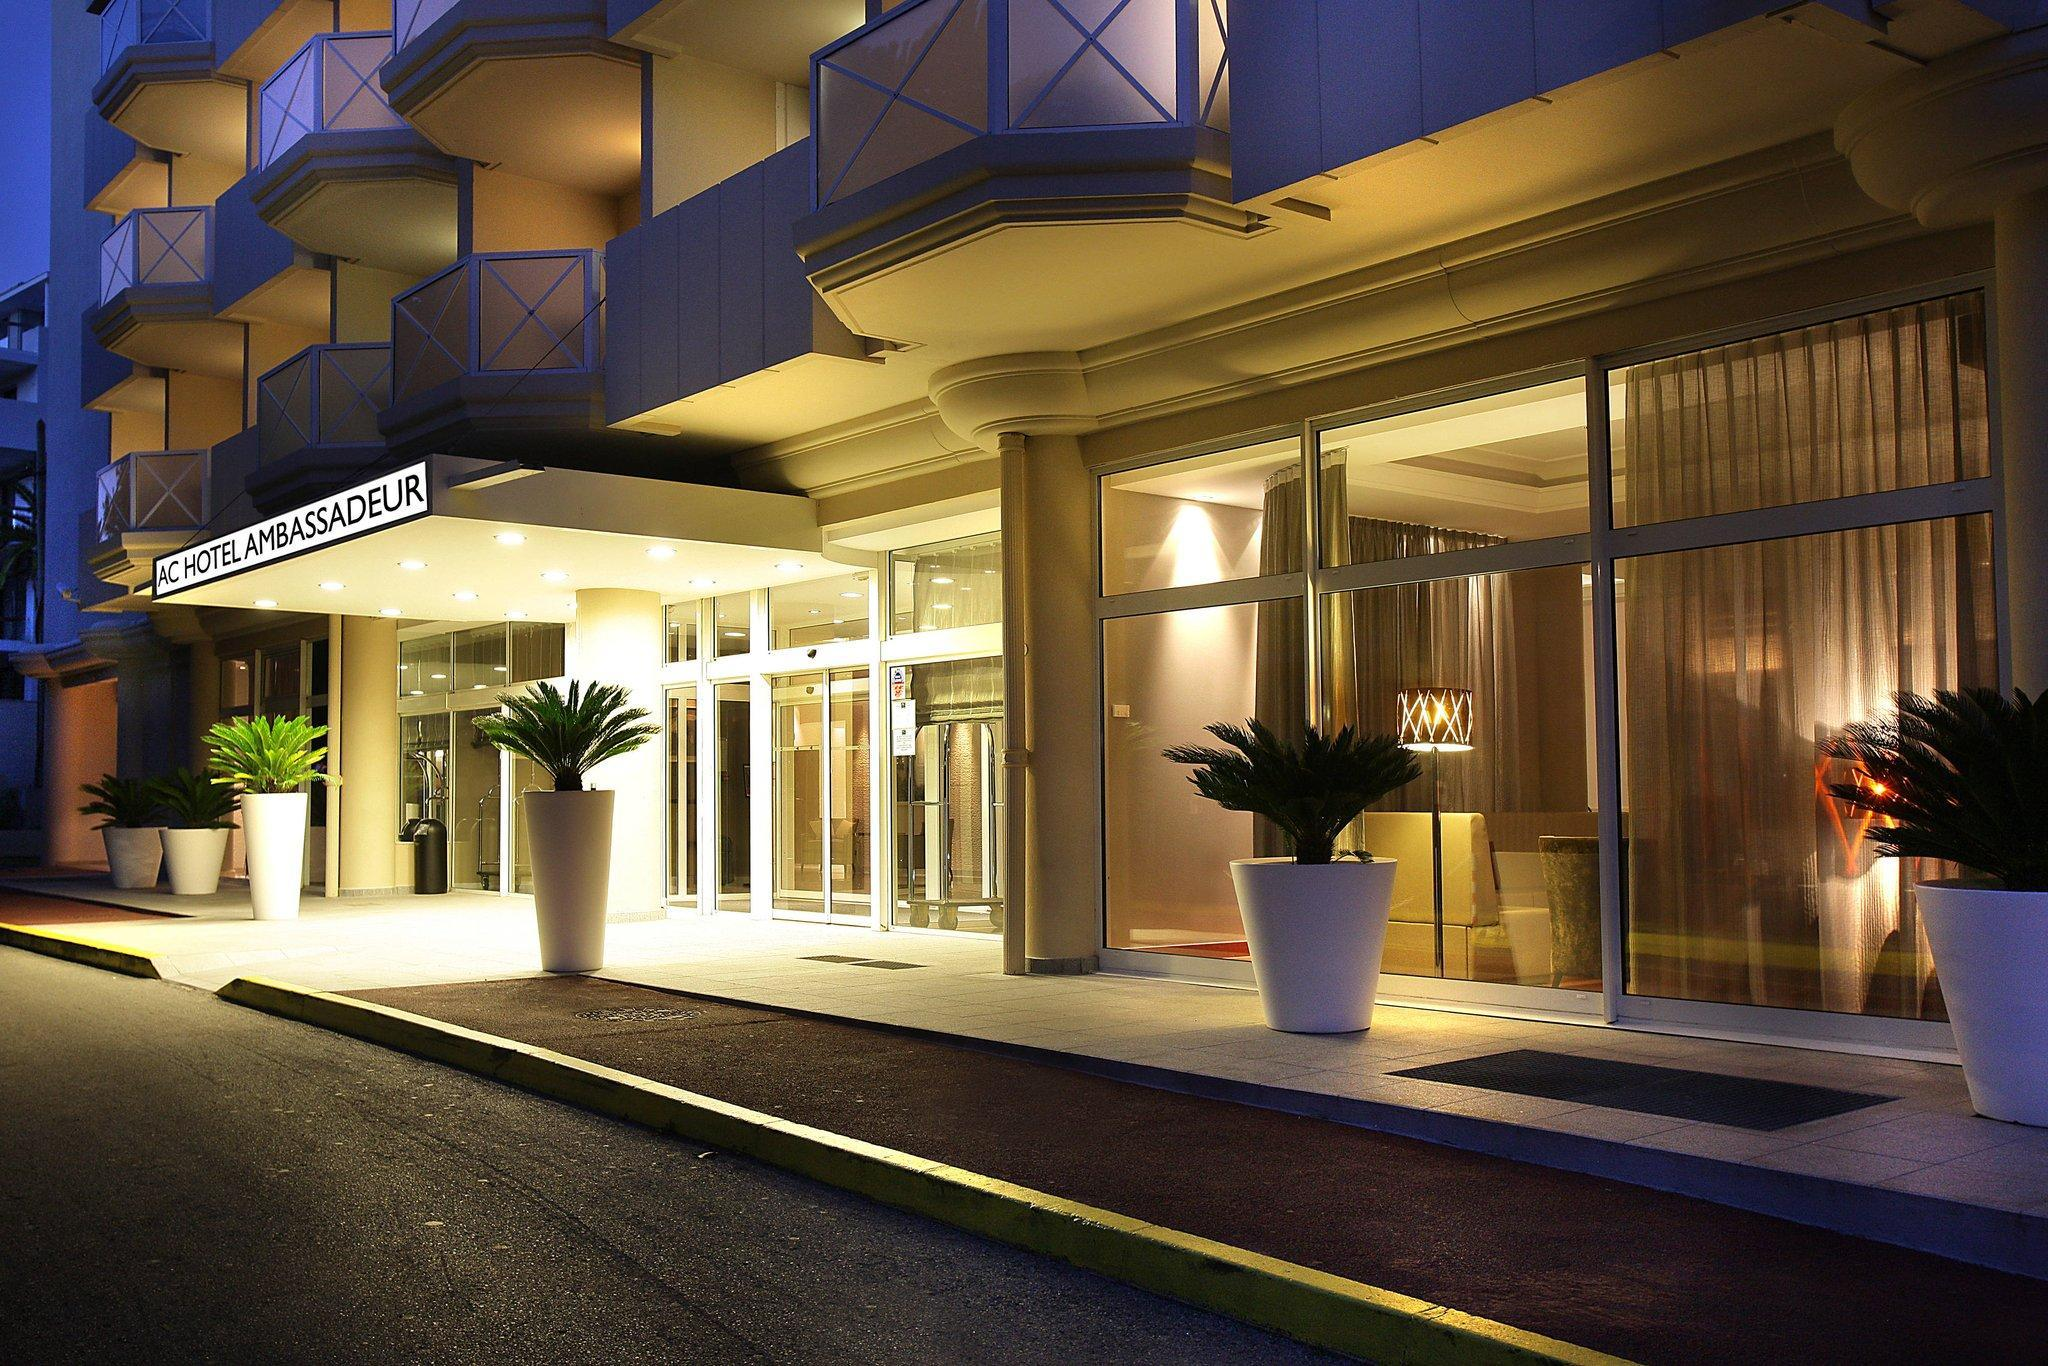 AC Hotel Ambassadeur Antibes  Juan Les Pins